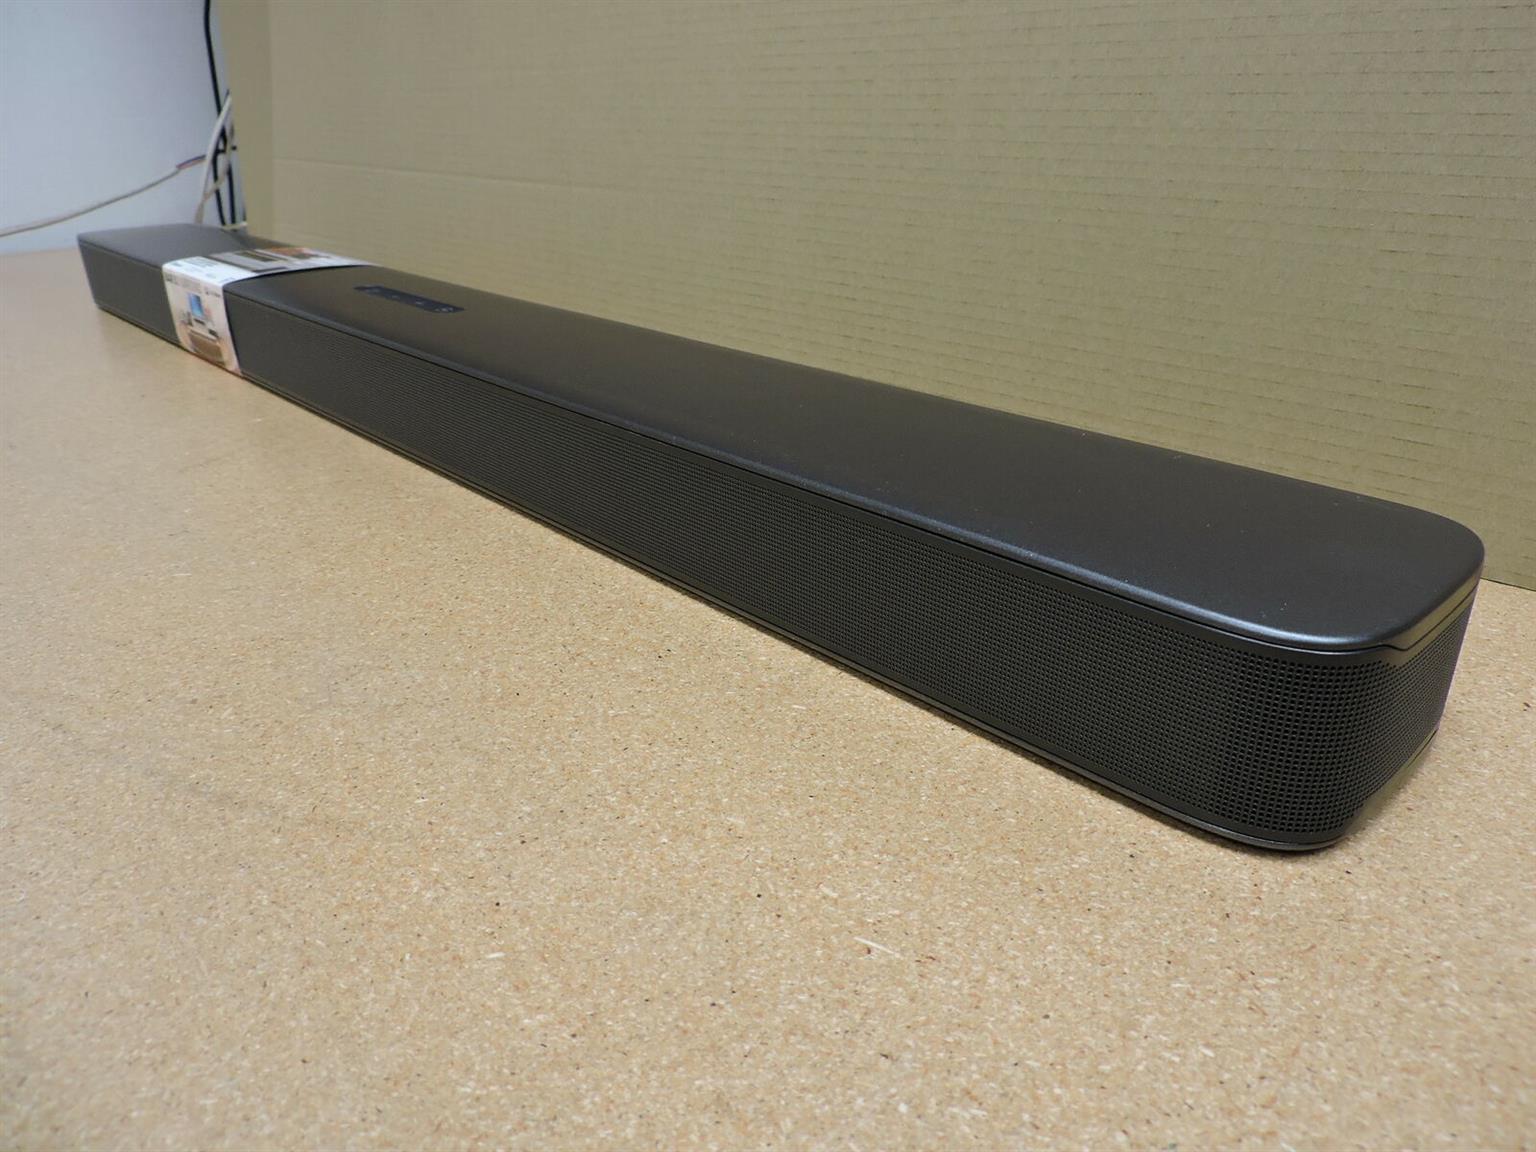 JBL souround 5.1 soundbar and sub used